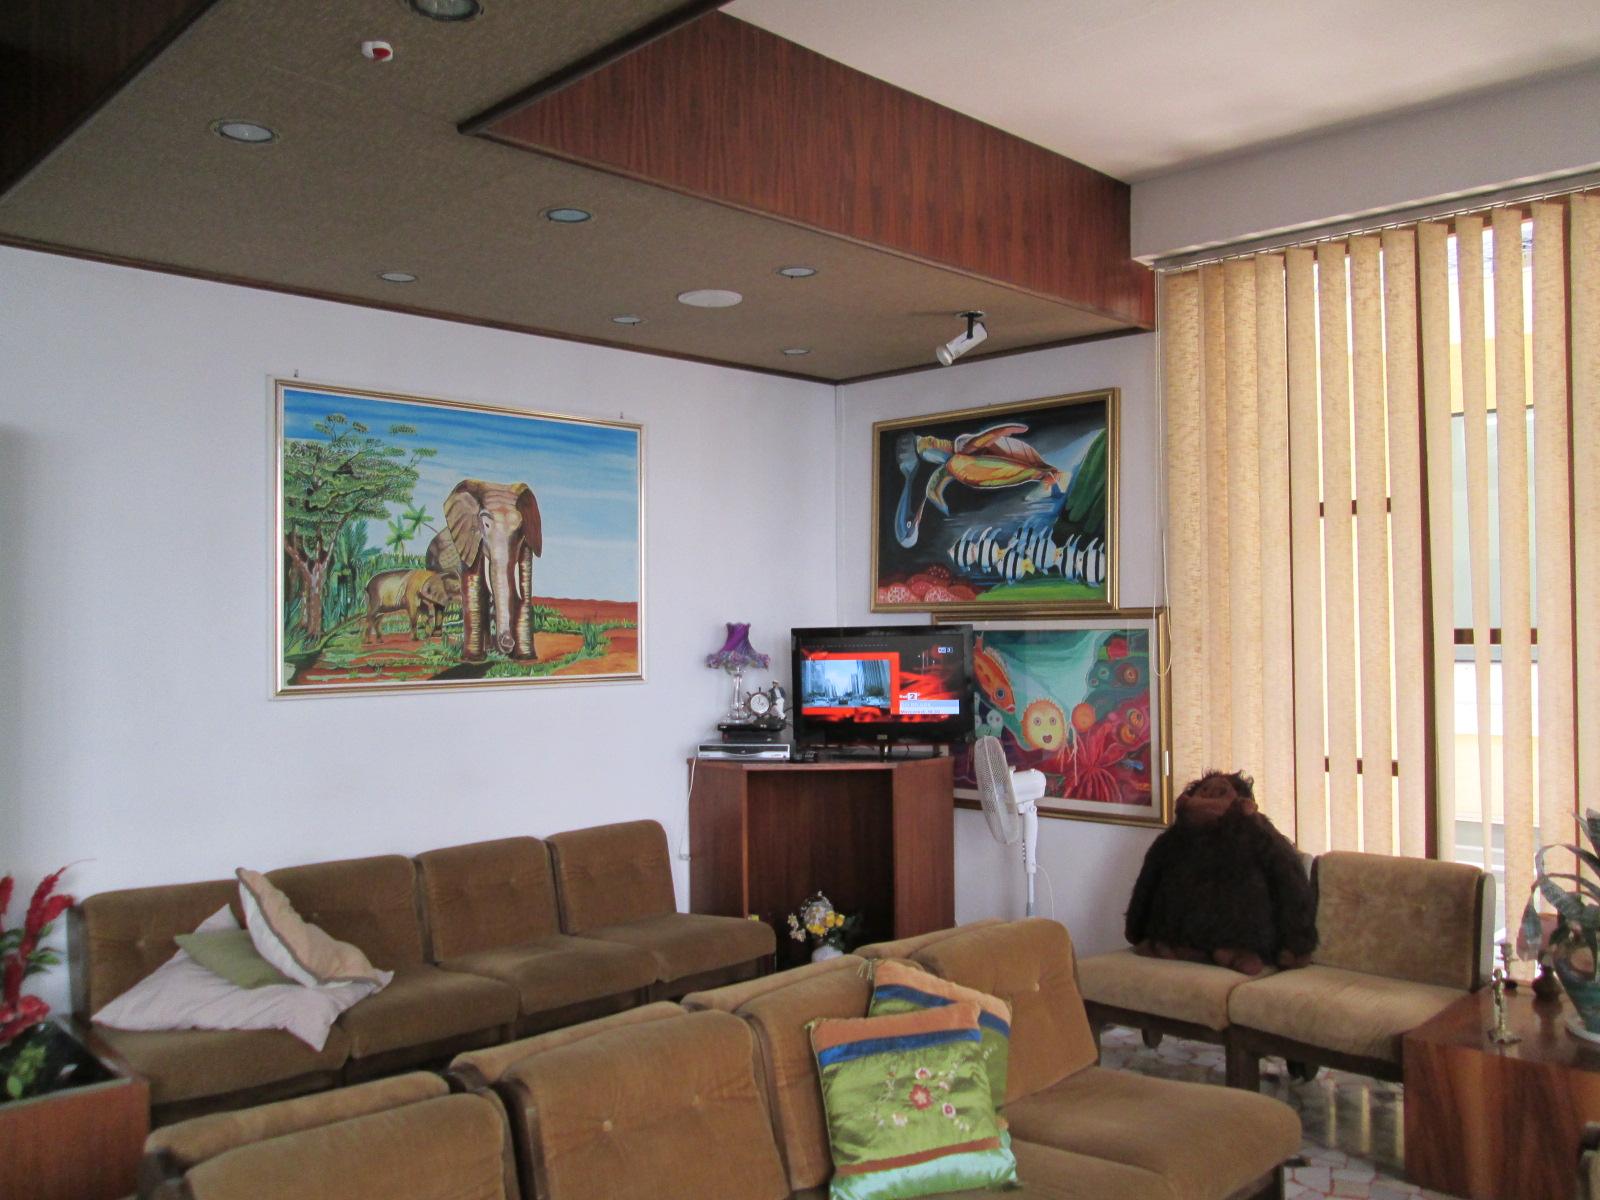 http://www.hotelclubitalgor.com/foto/servizi3.jpg